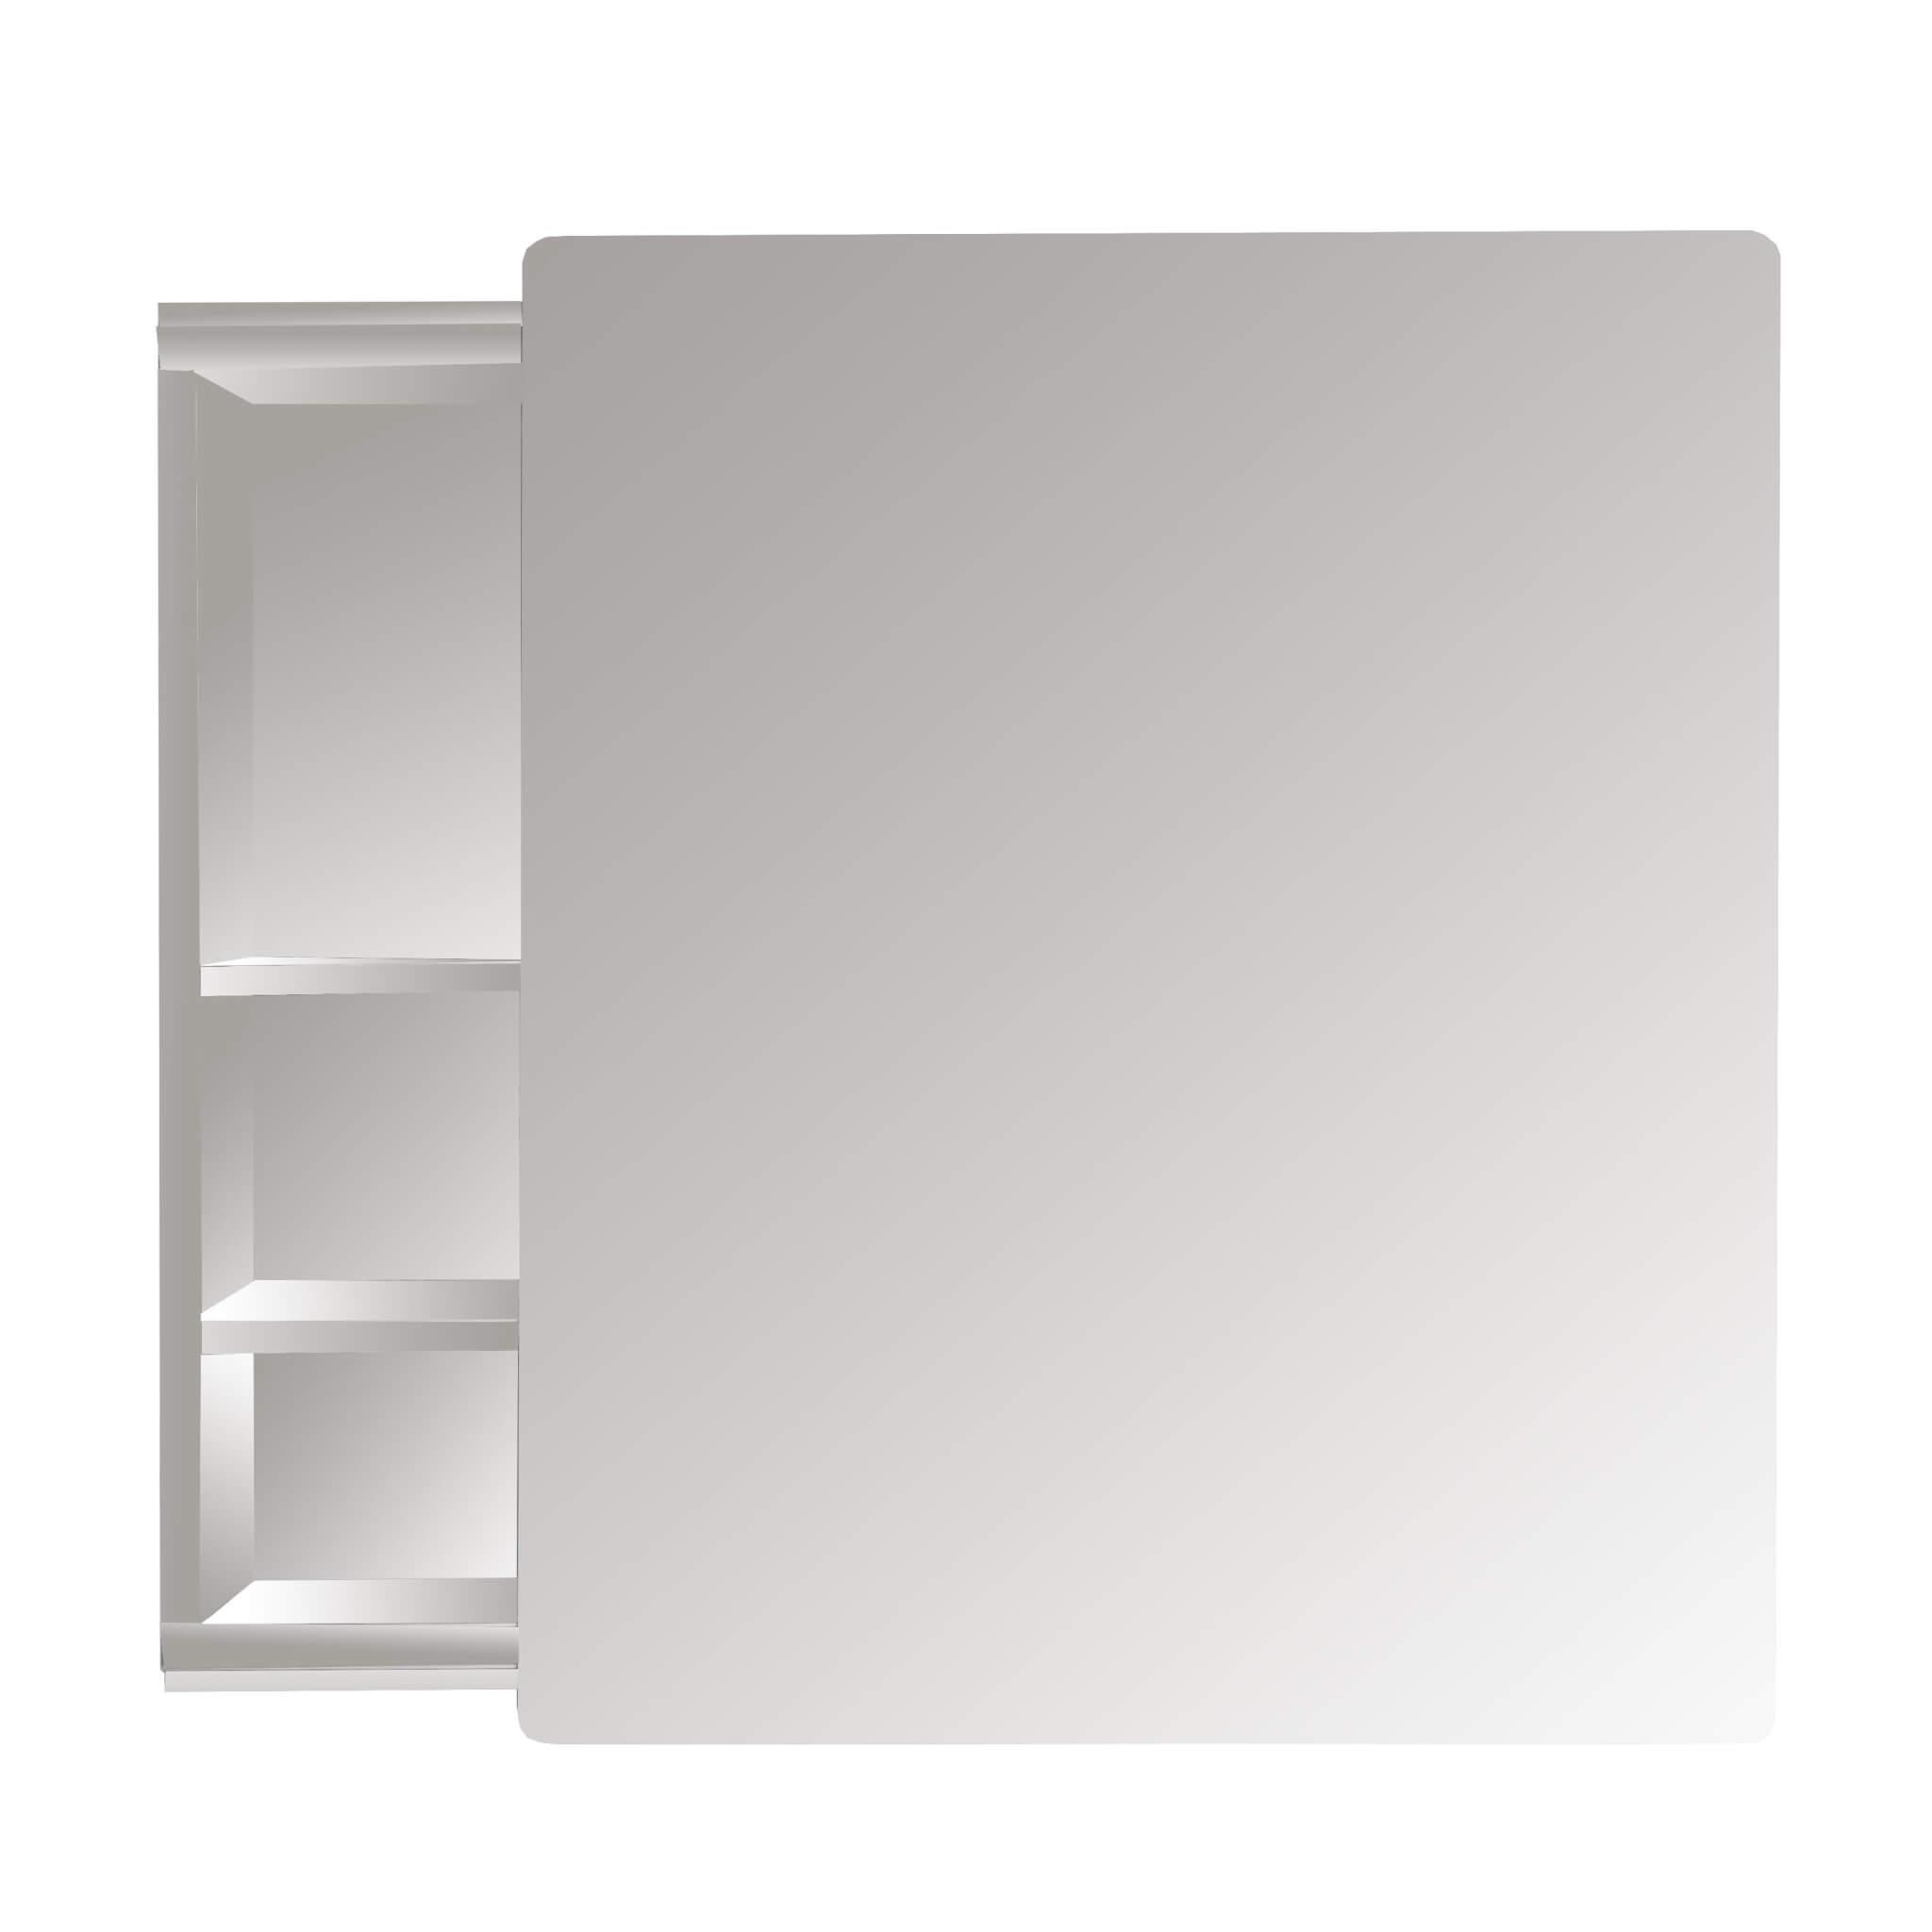 AF Mirror Cabinet Stainless Steel Sliding 46X56